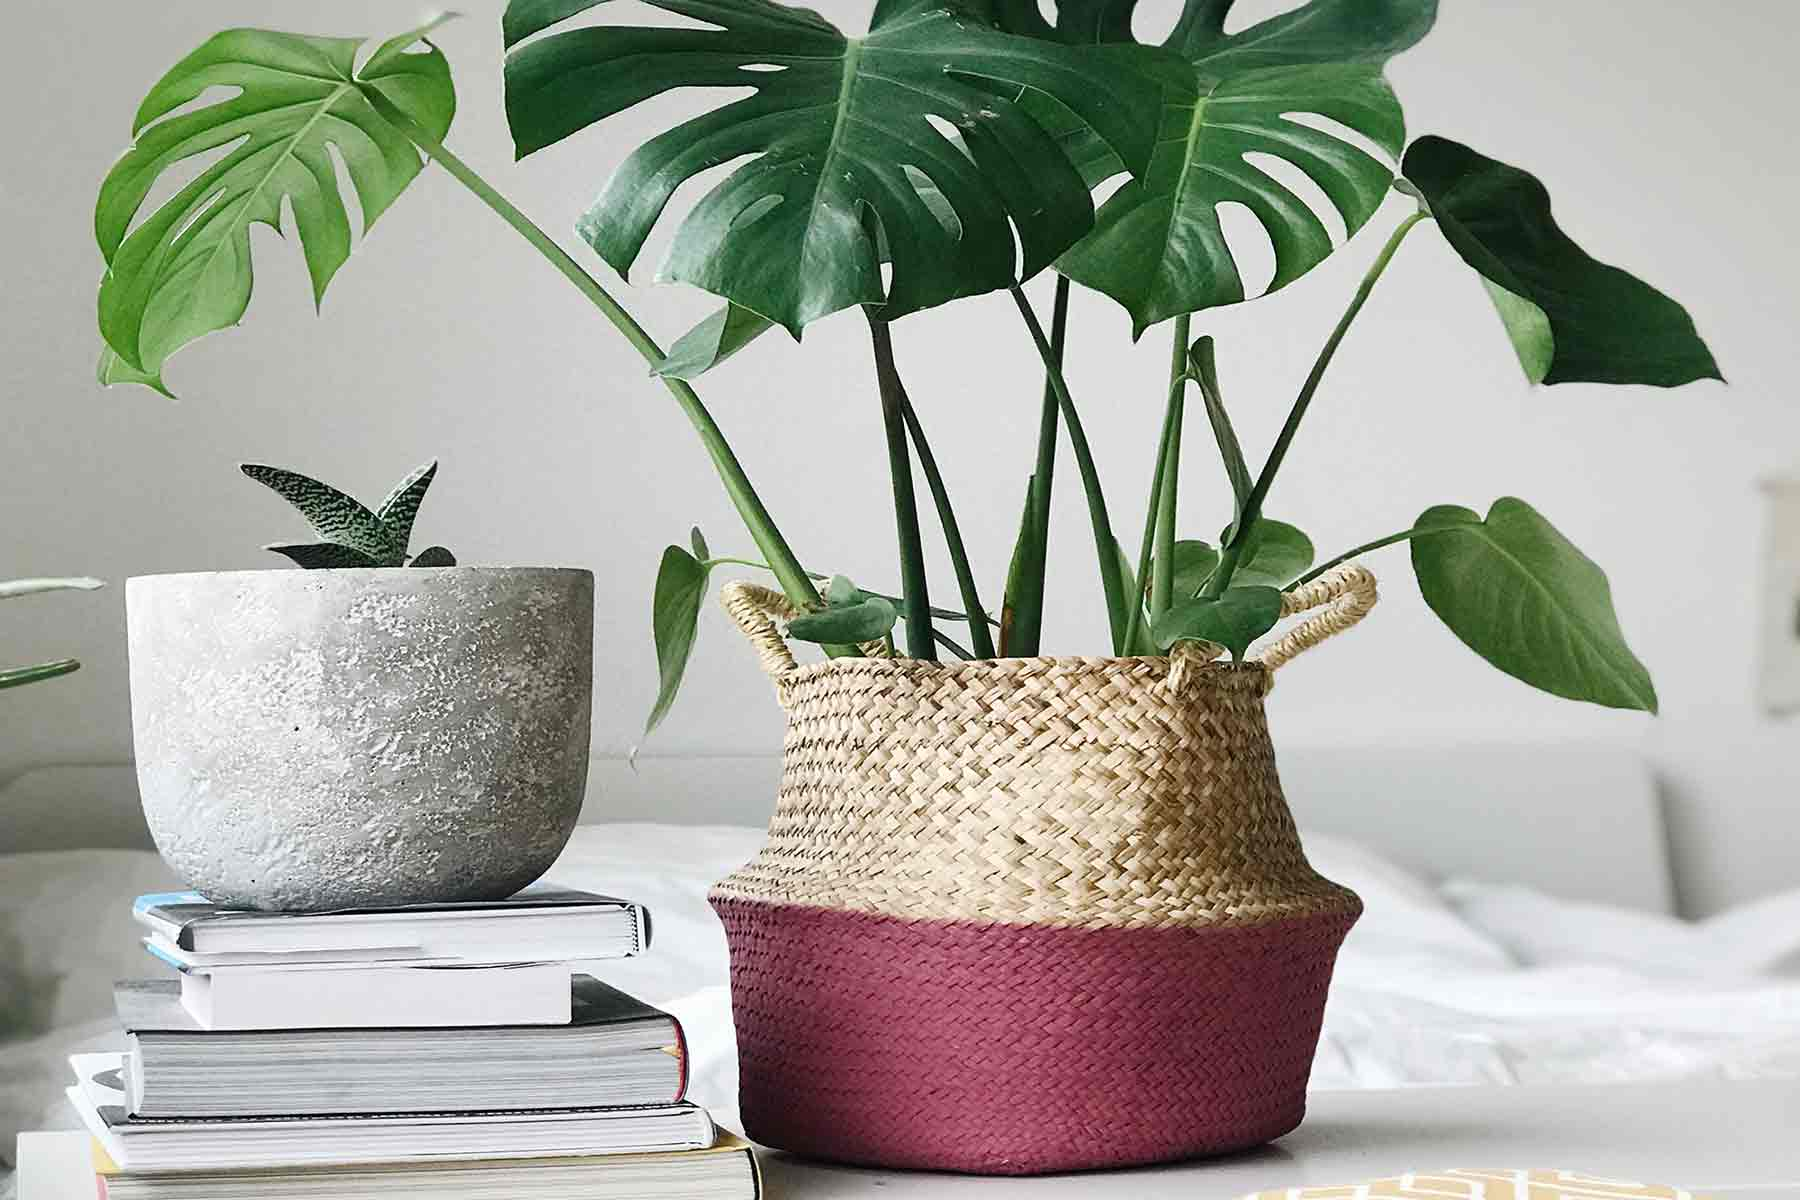 Cara Memilih Pot yang Pas untuk Mempercantik Dekorasi Tanaman Hias Anda | Foto artikel Arsitag